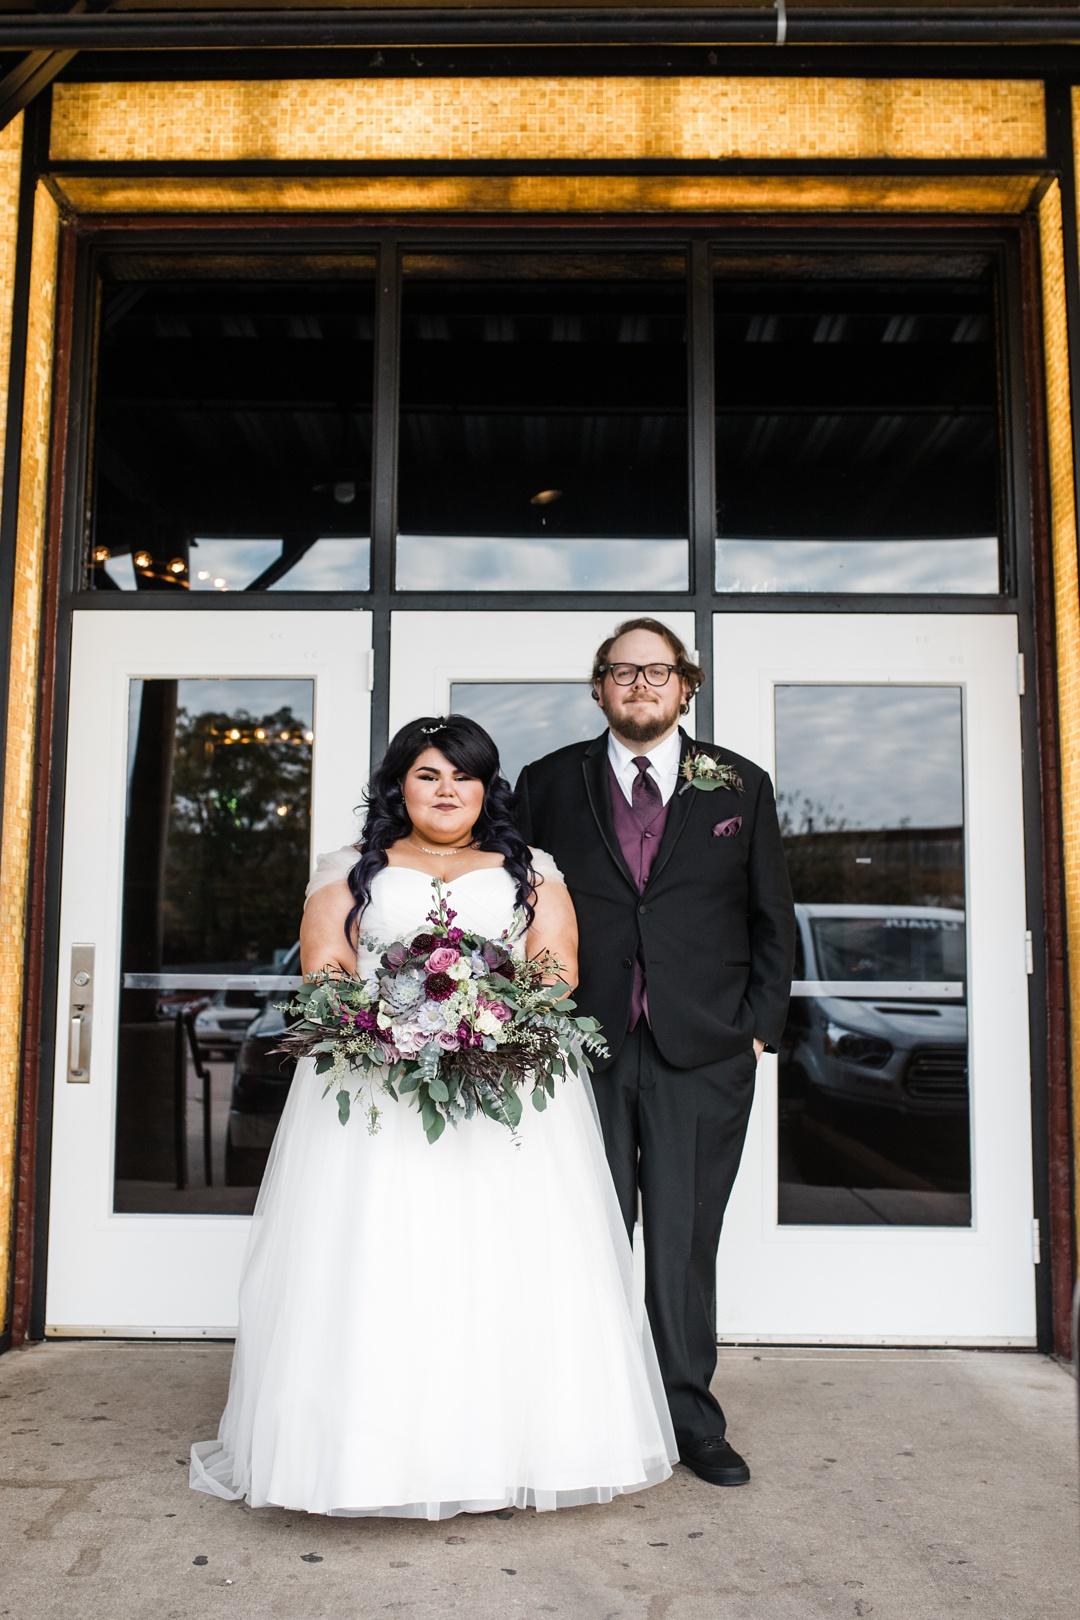 gilleys_dallas_wedding-39